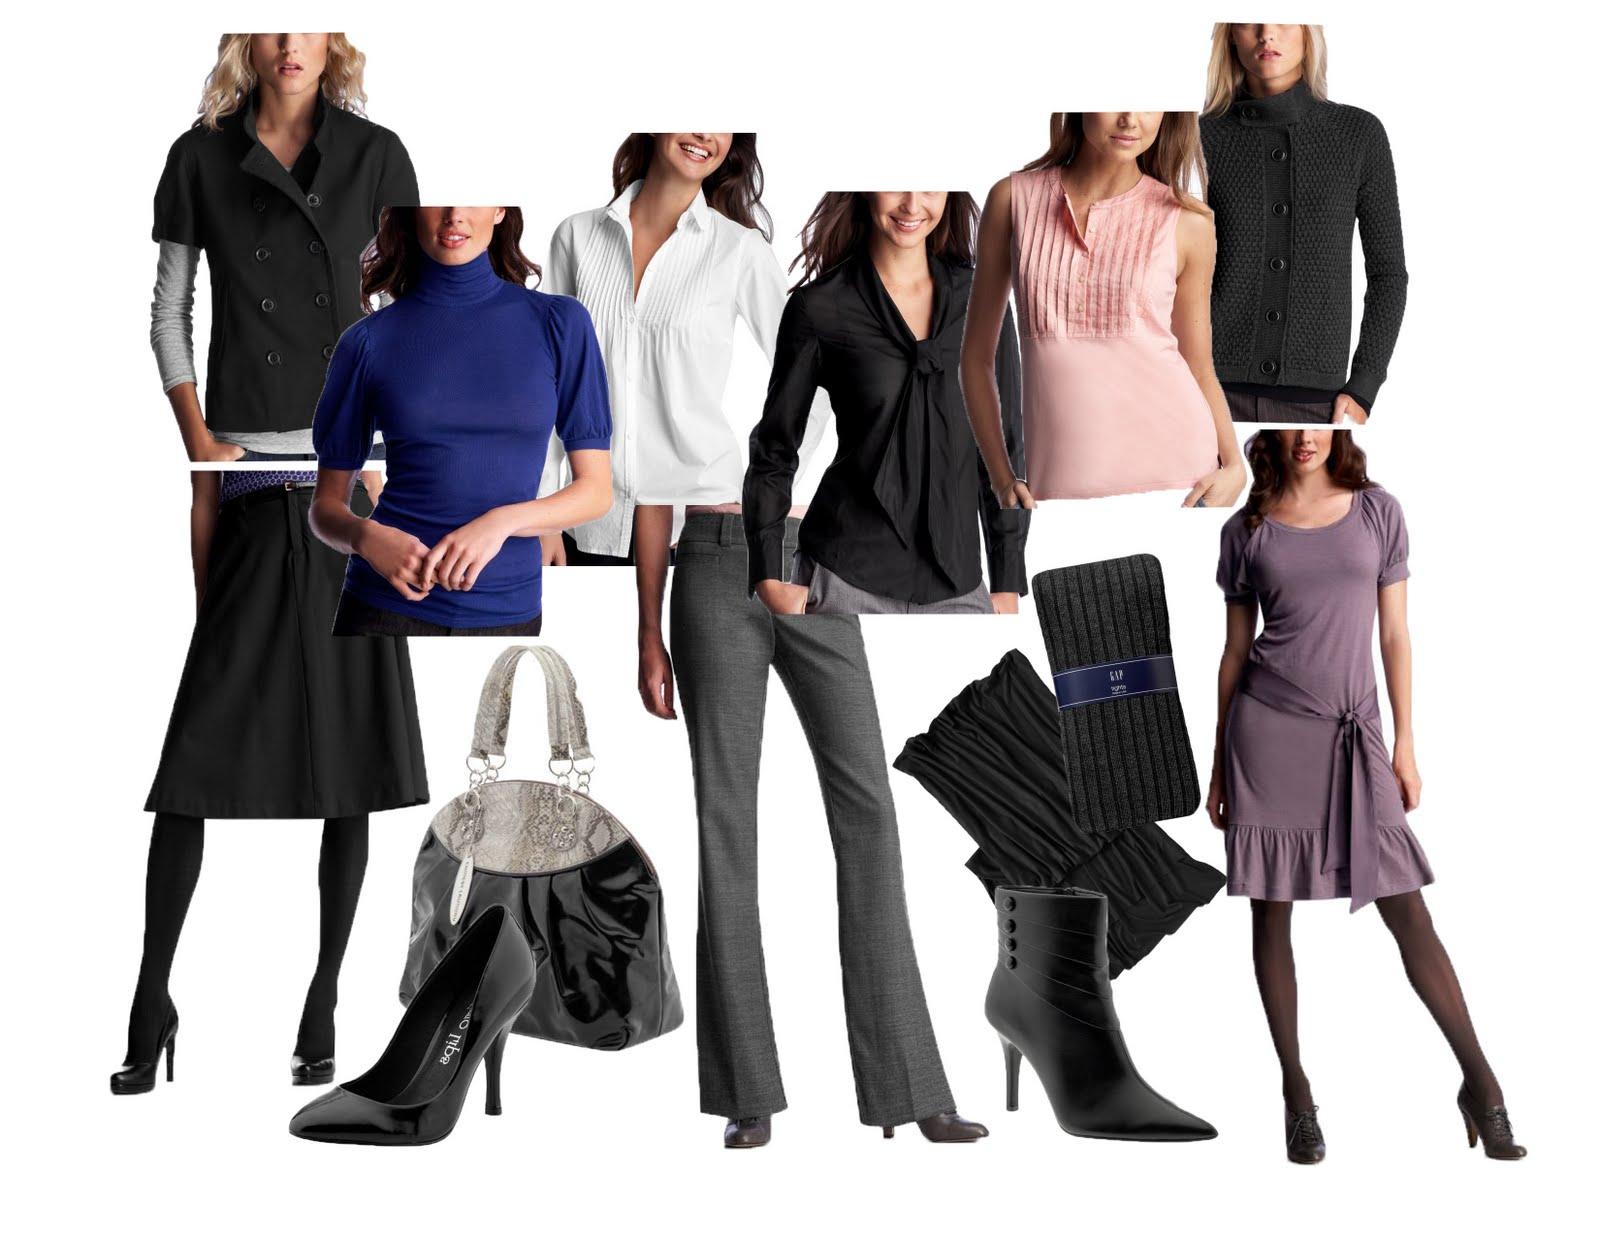 business dress for women women dresses. Black Bedroom Furniture Sets. Home Design Ideas